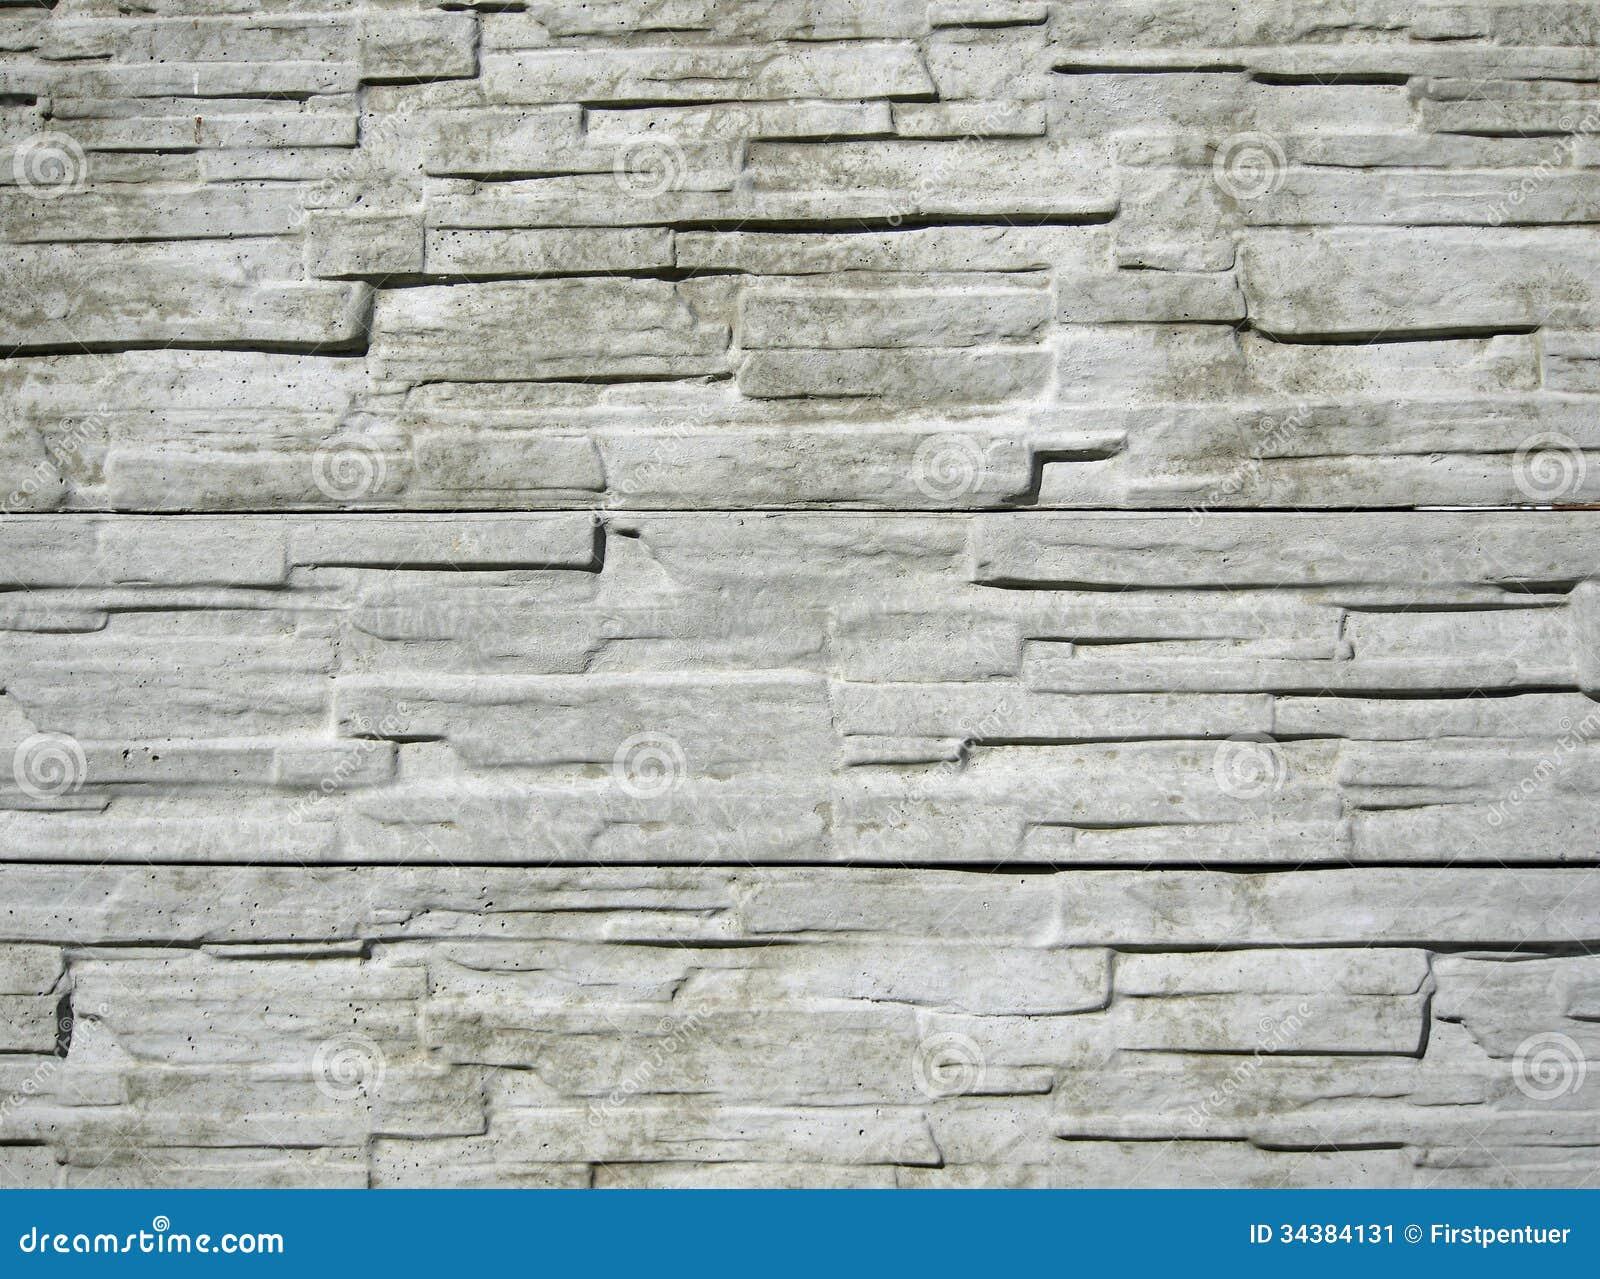 Horizontally Structured White Brick Wall Stock Image